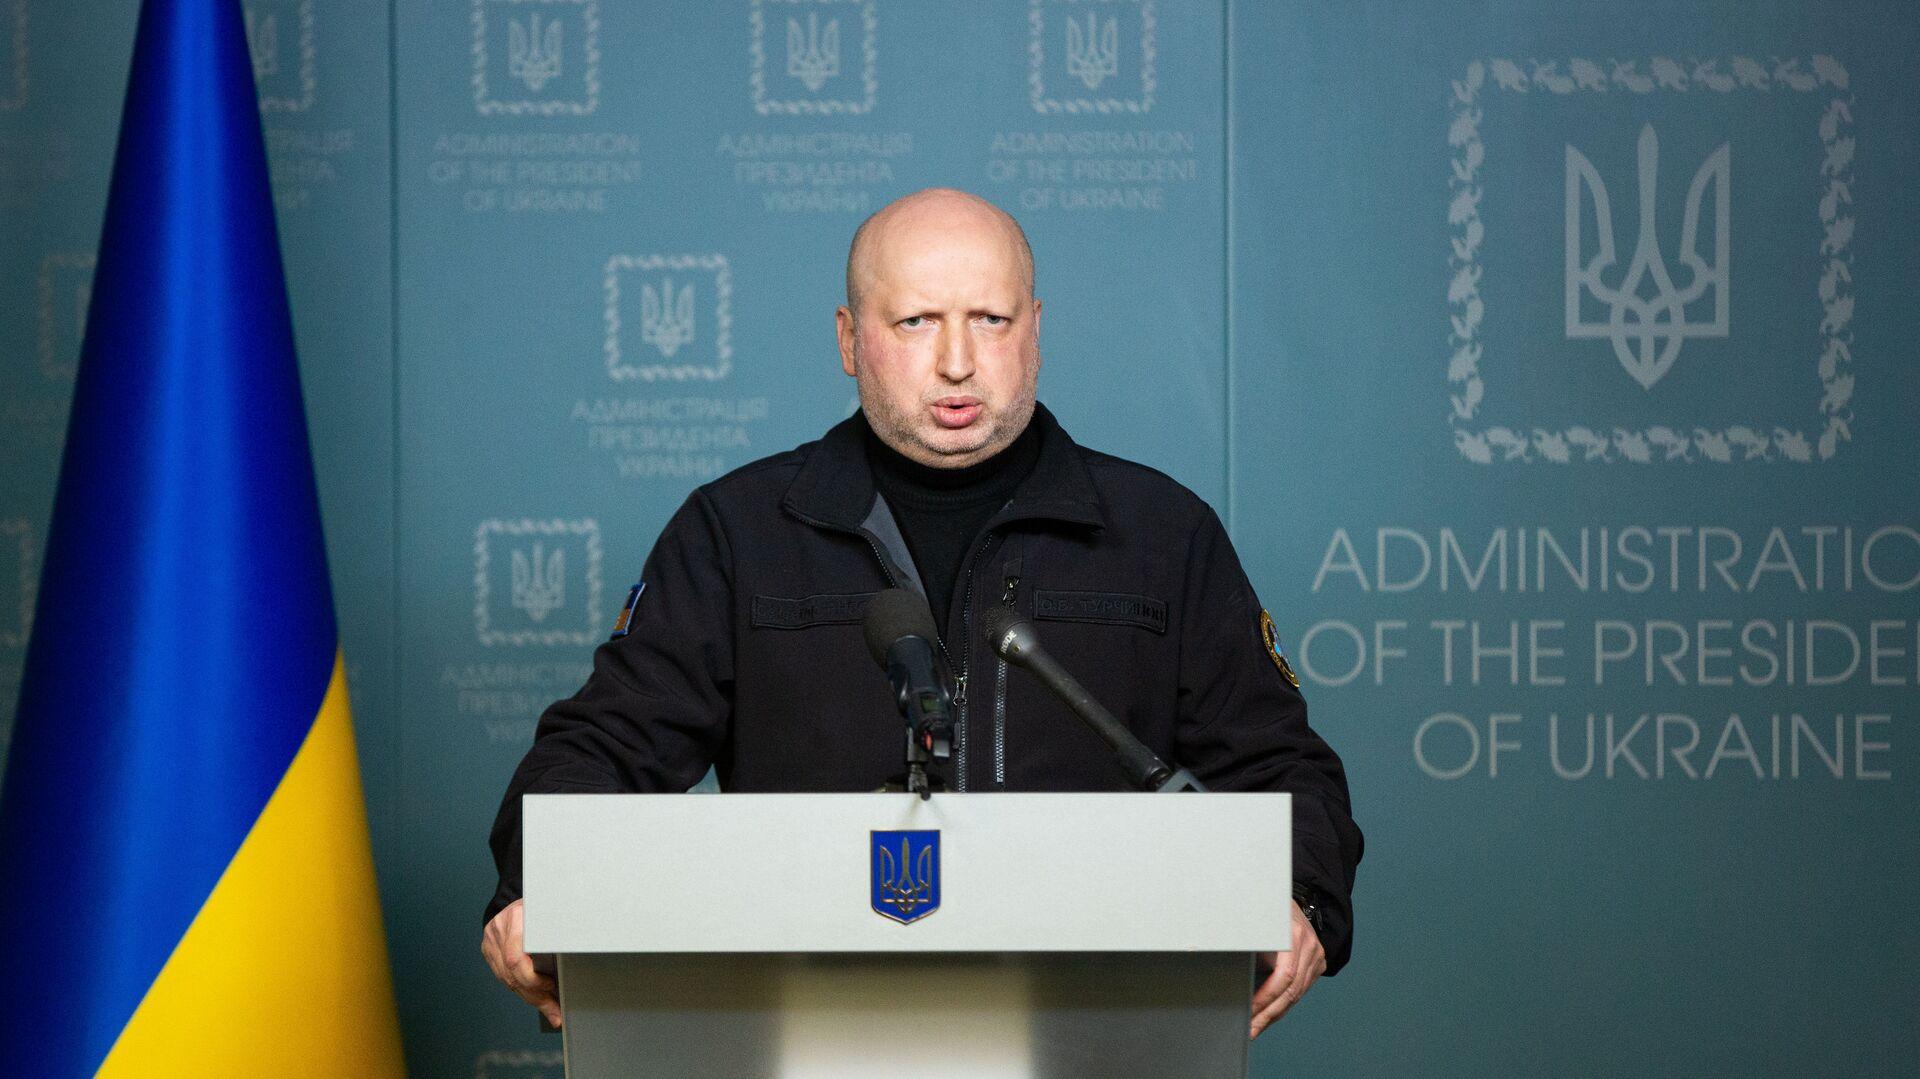 Экс-секретарь СНБО Александр Турчинов - РИА Новости, 1920, 27.02.2021